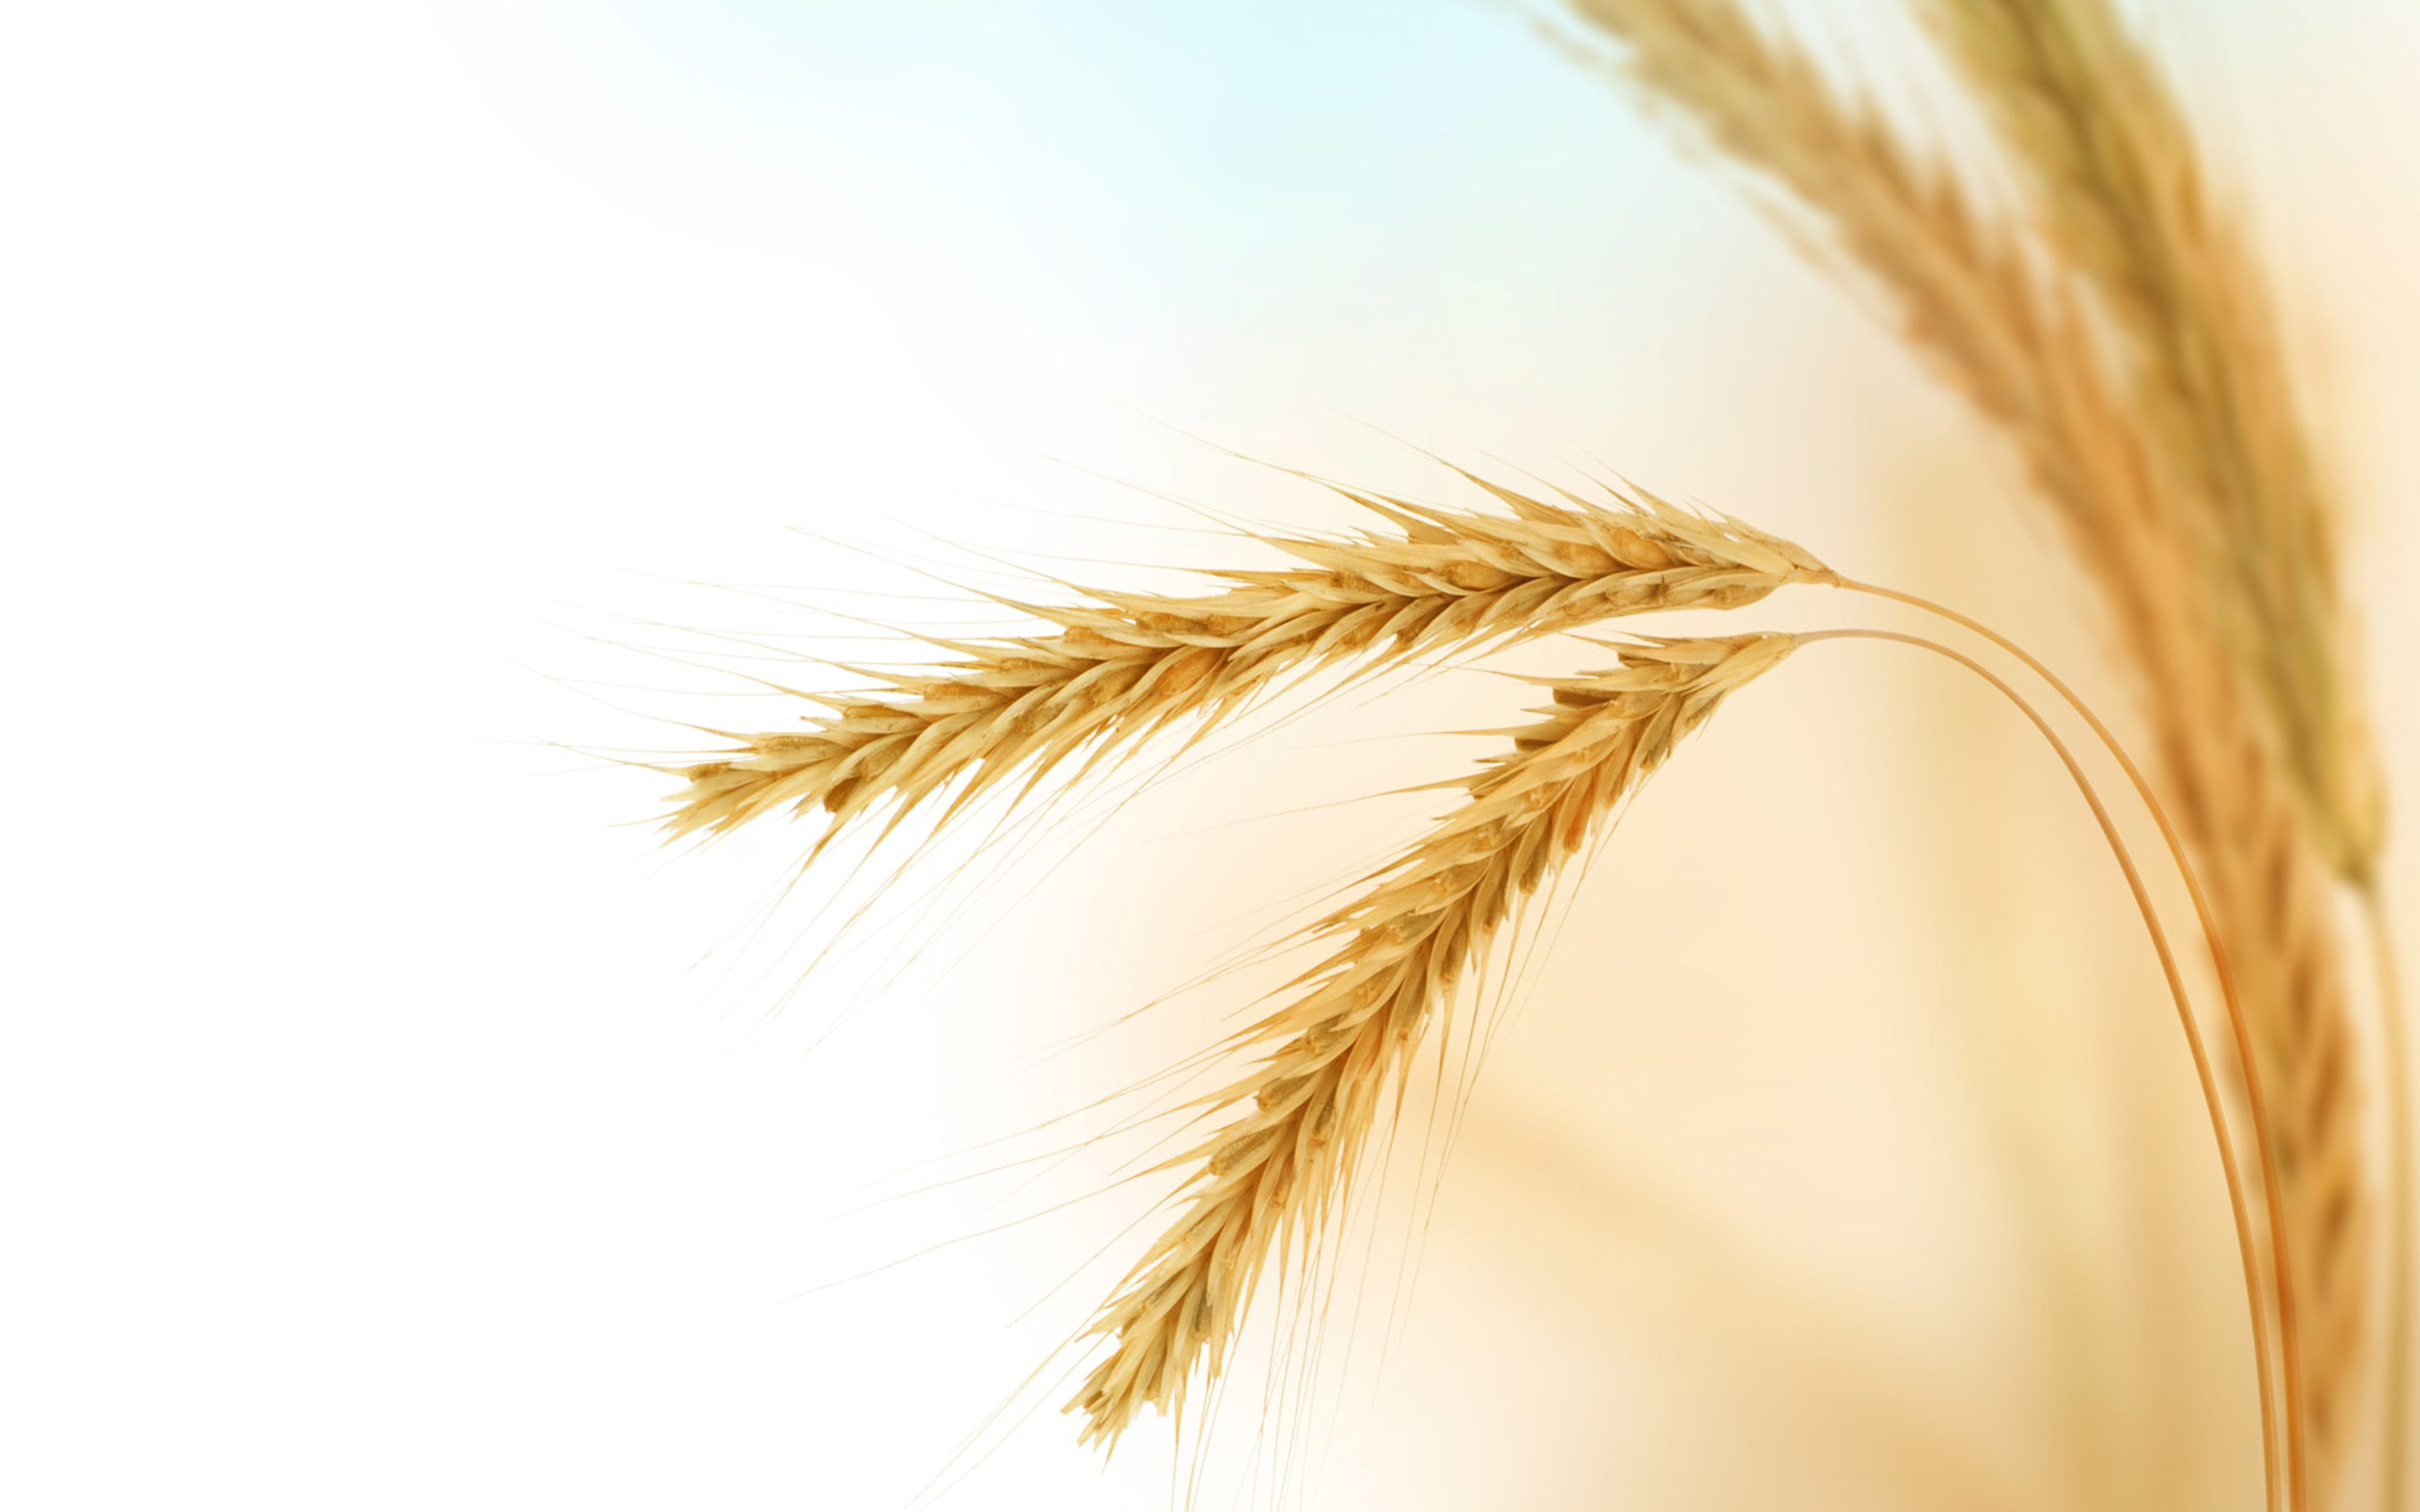 Wallpaper Download 5120x3200 Wonderful Golden Ear Of Wheat Macro Beautiful Macro Wallpapers Hd Wallpaper Downlo Wheat Wallpaper Wheat Pictures Wheat Fields